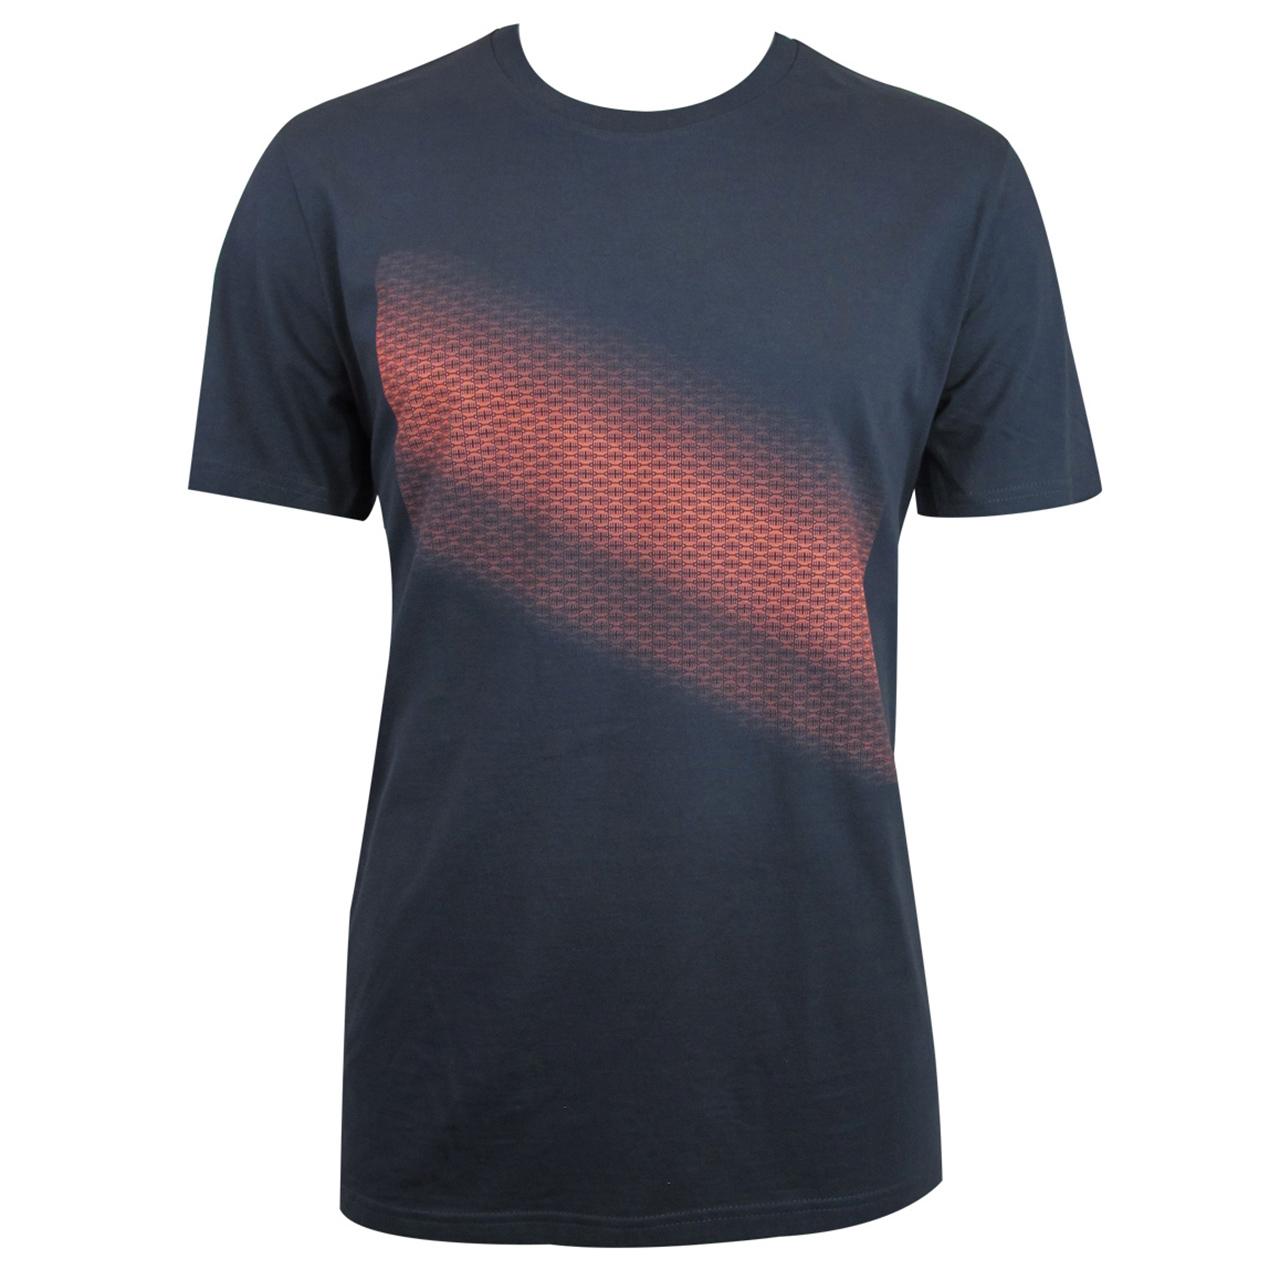 Berlin T-Shirt mit Farbverlauf Brandenburger Tor Diagonal grau/neonorange